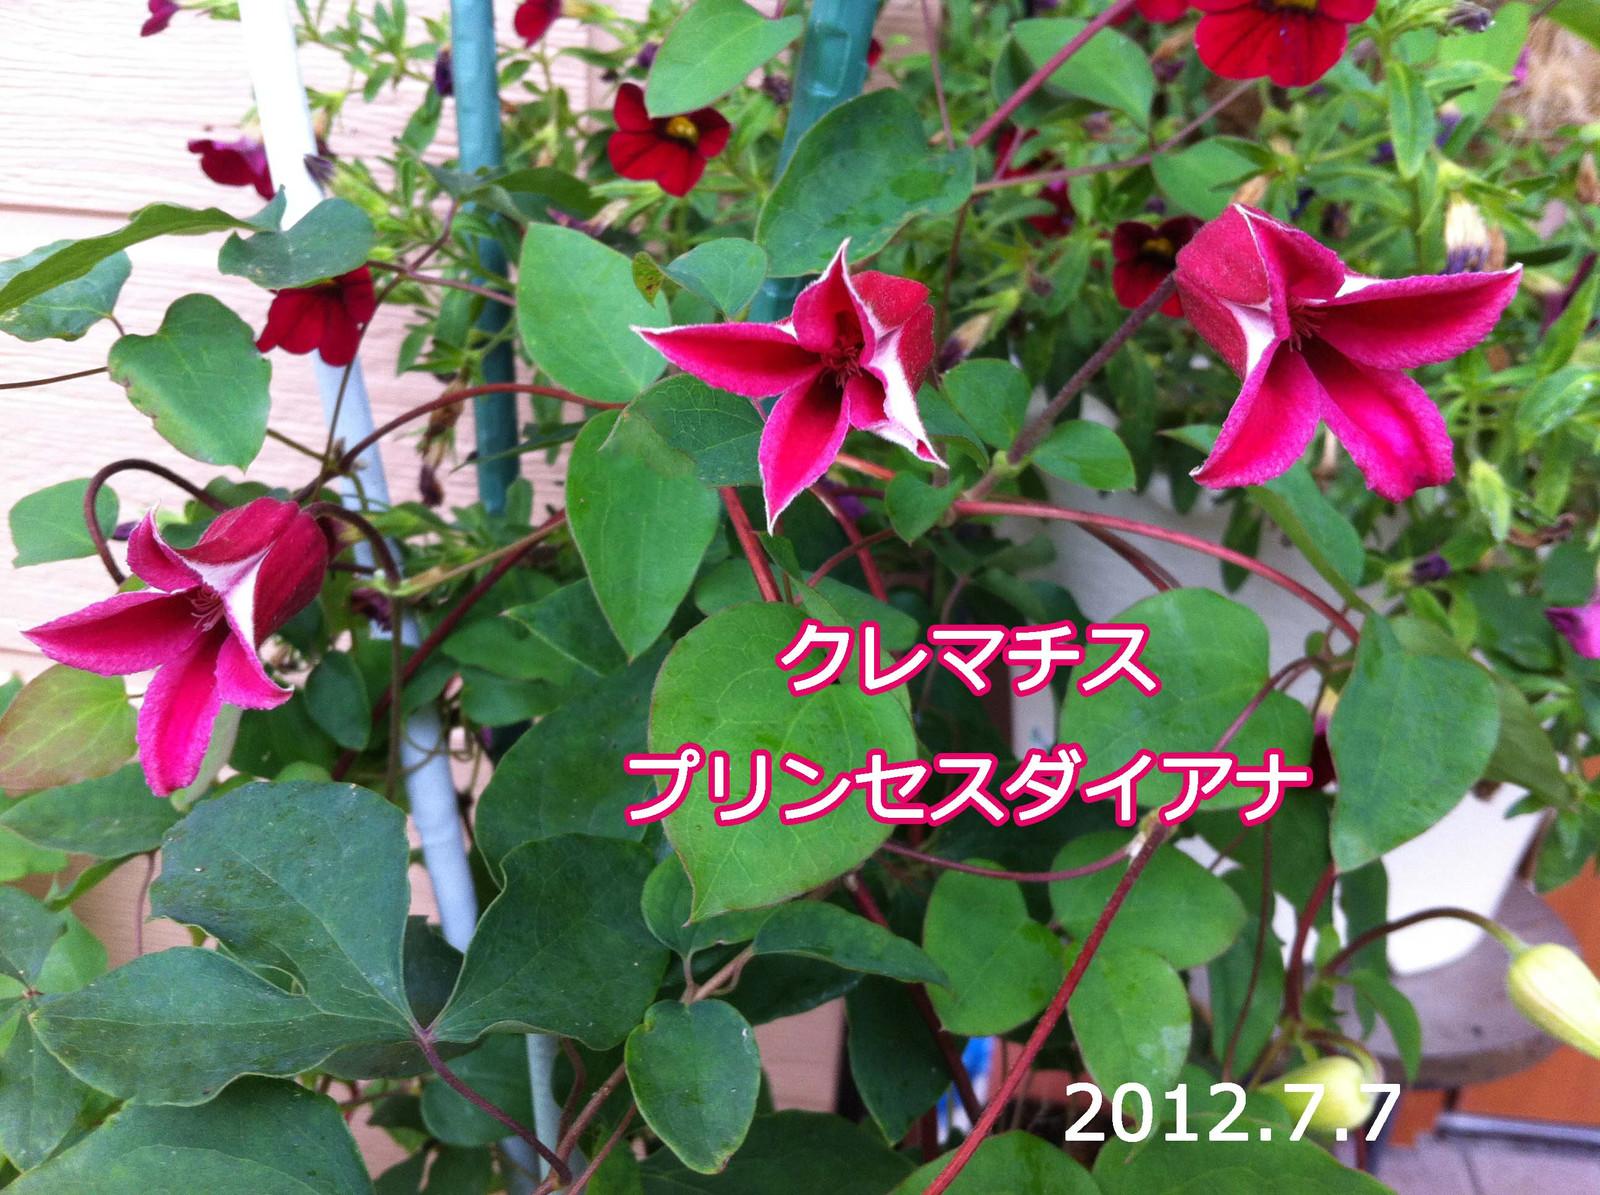 2012_07_07_5940_edited1